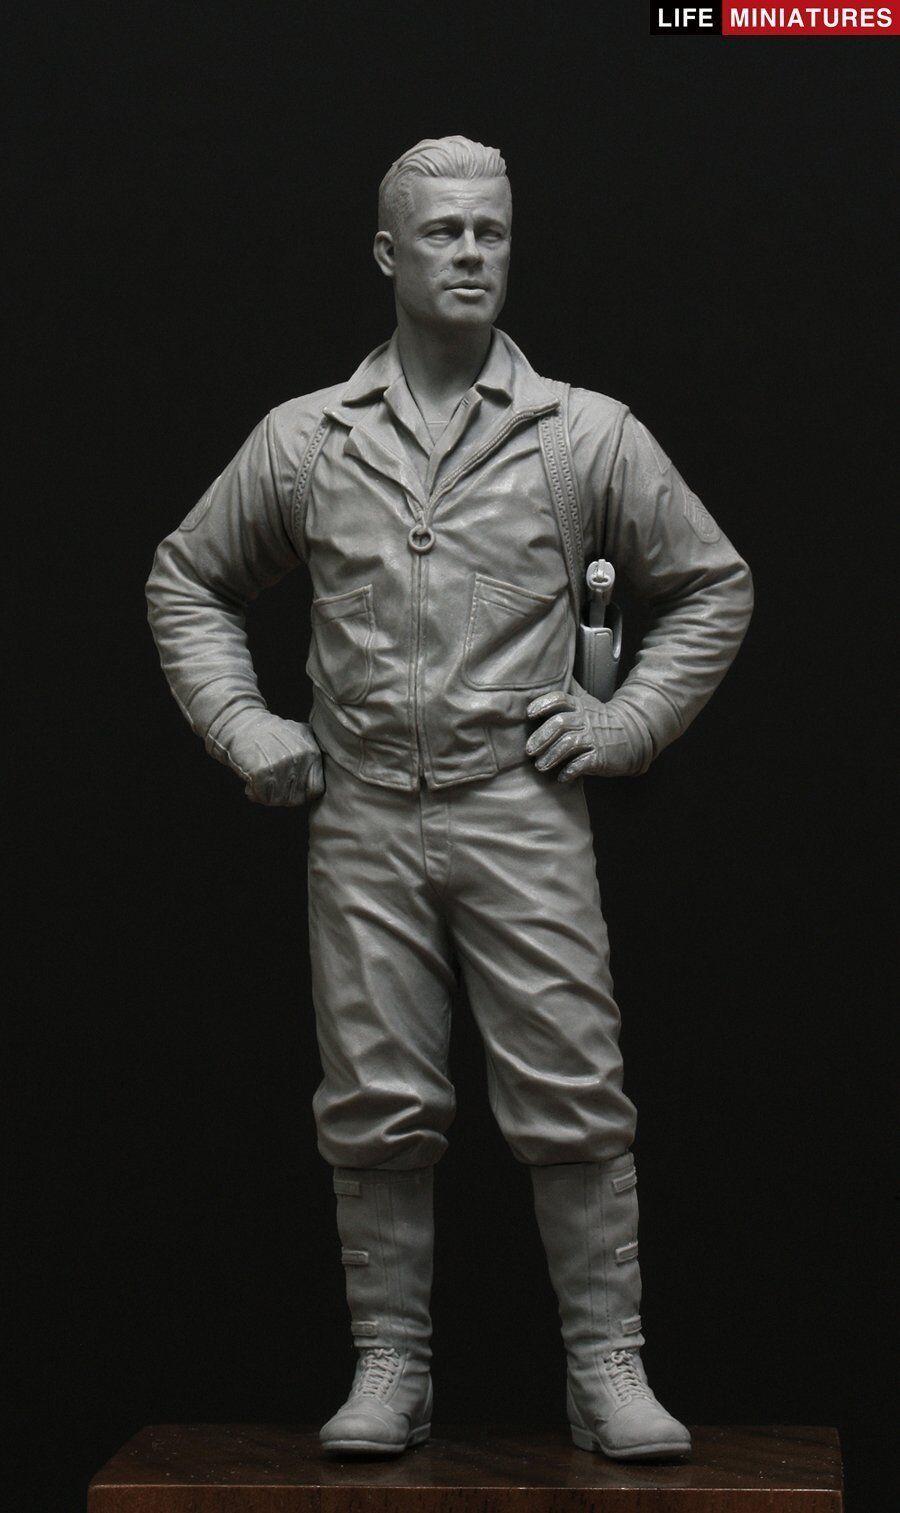 Life Miniatures 1 16 WWII U.S. Tank Commander  War Daddy